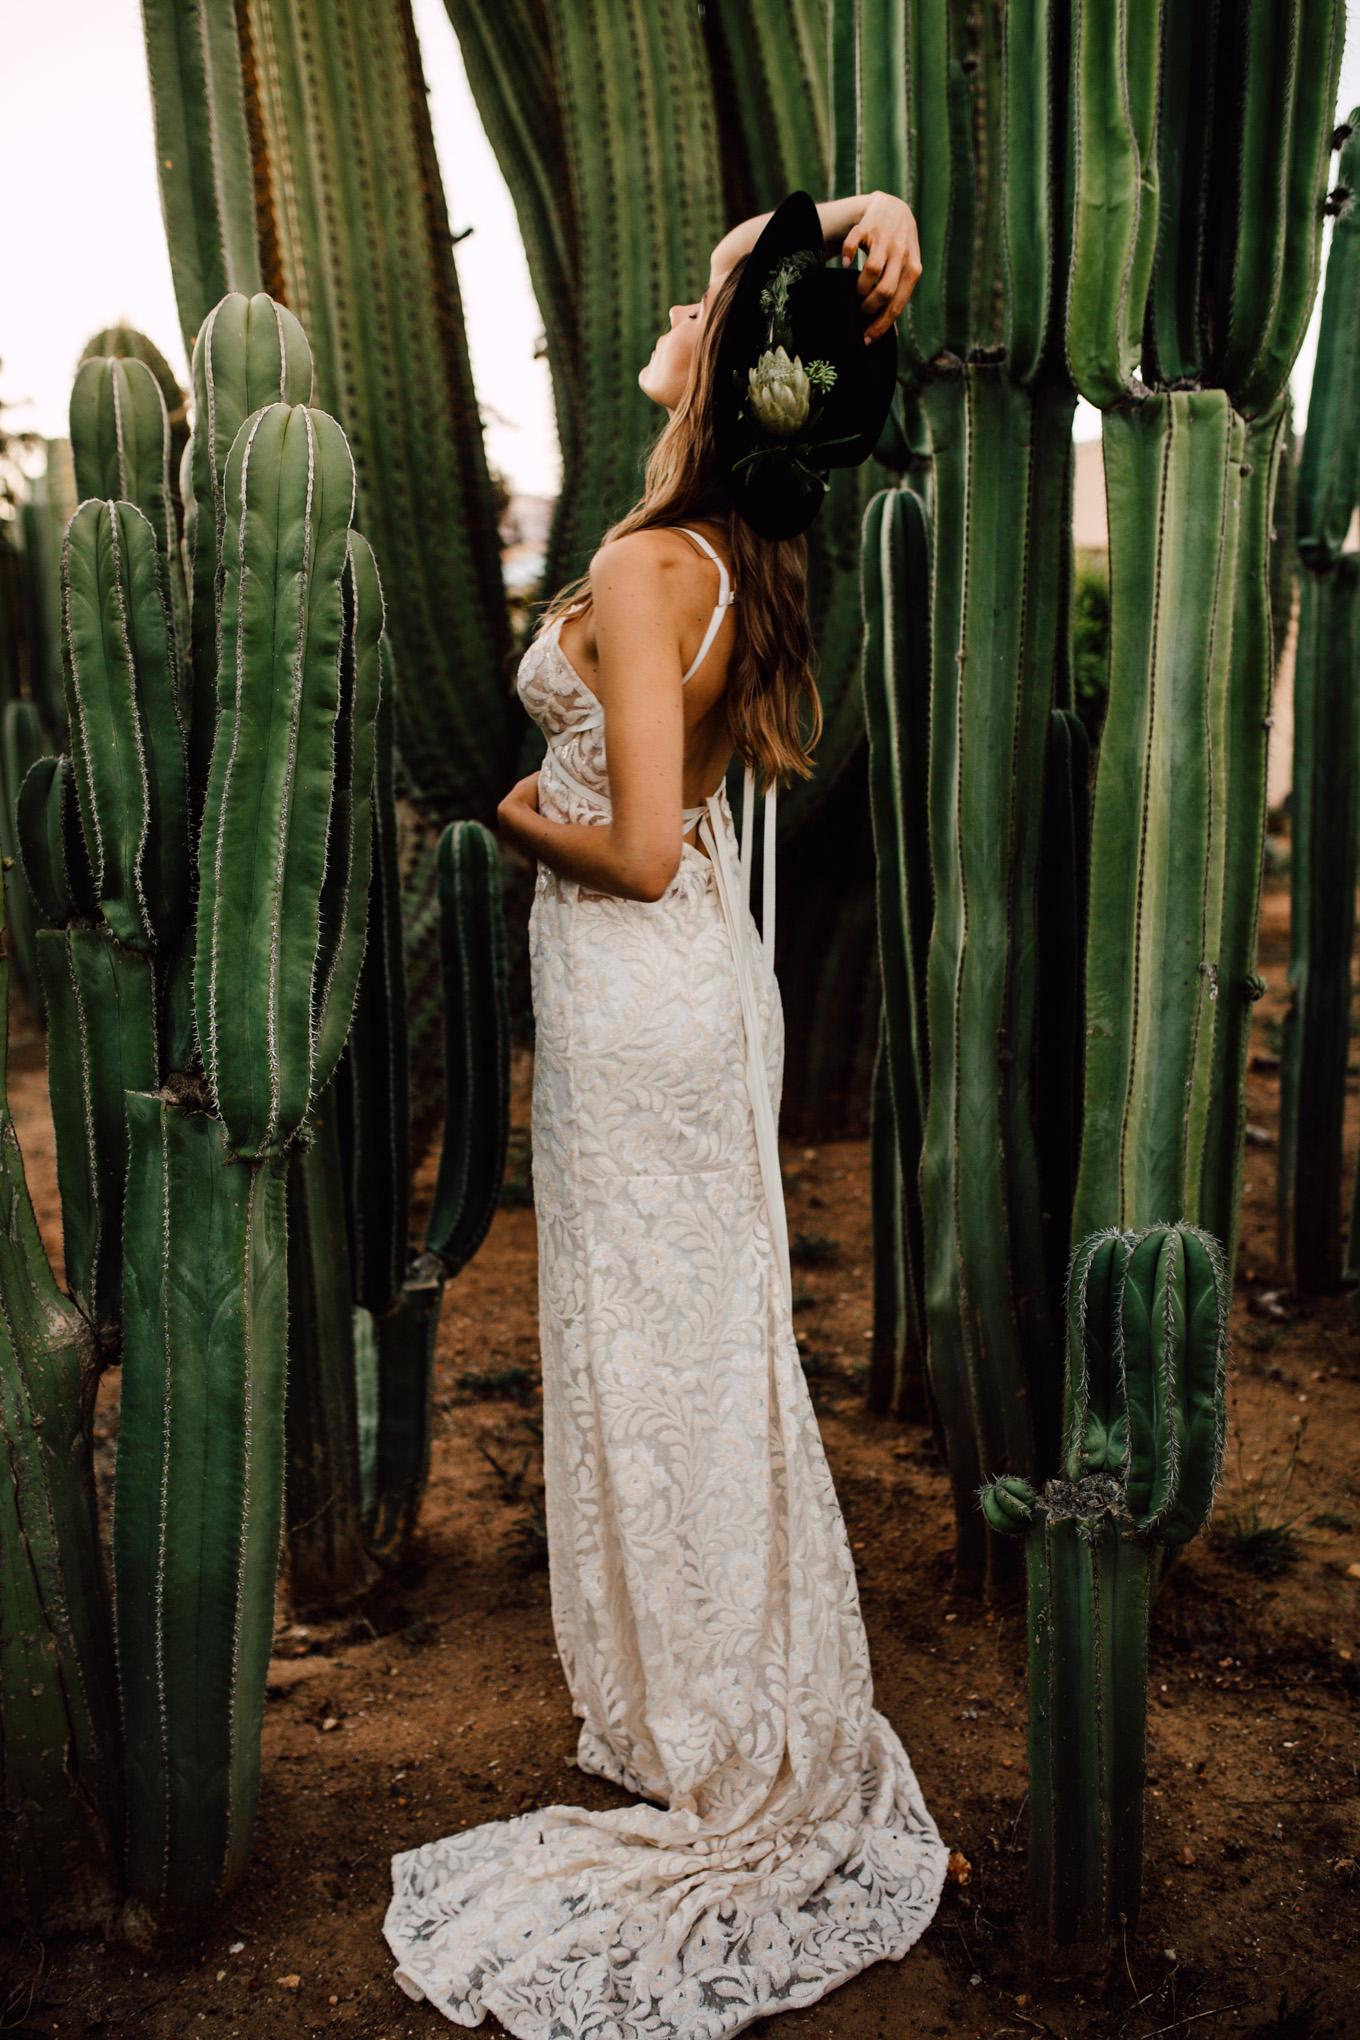 Cape-Town-Pia-Anna-Christian-Wedding-Photography-South-Africa-Bride-Cactus-18.jpg